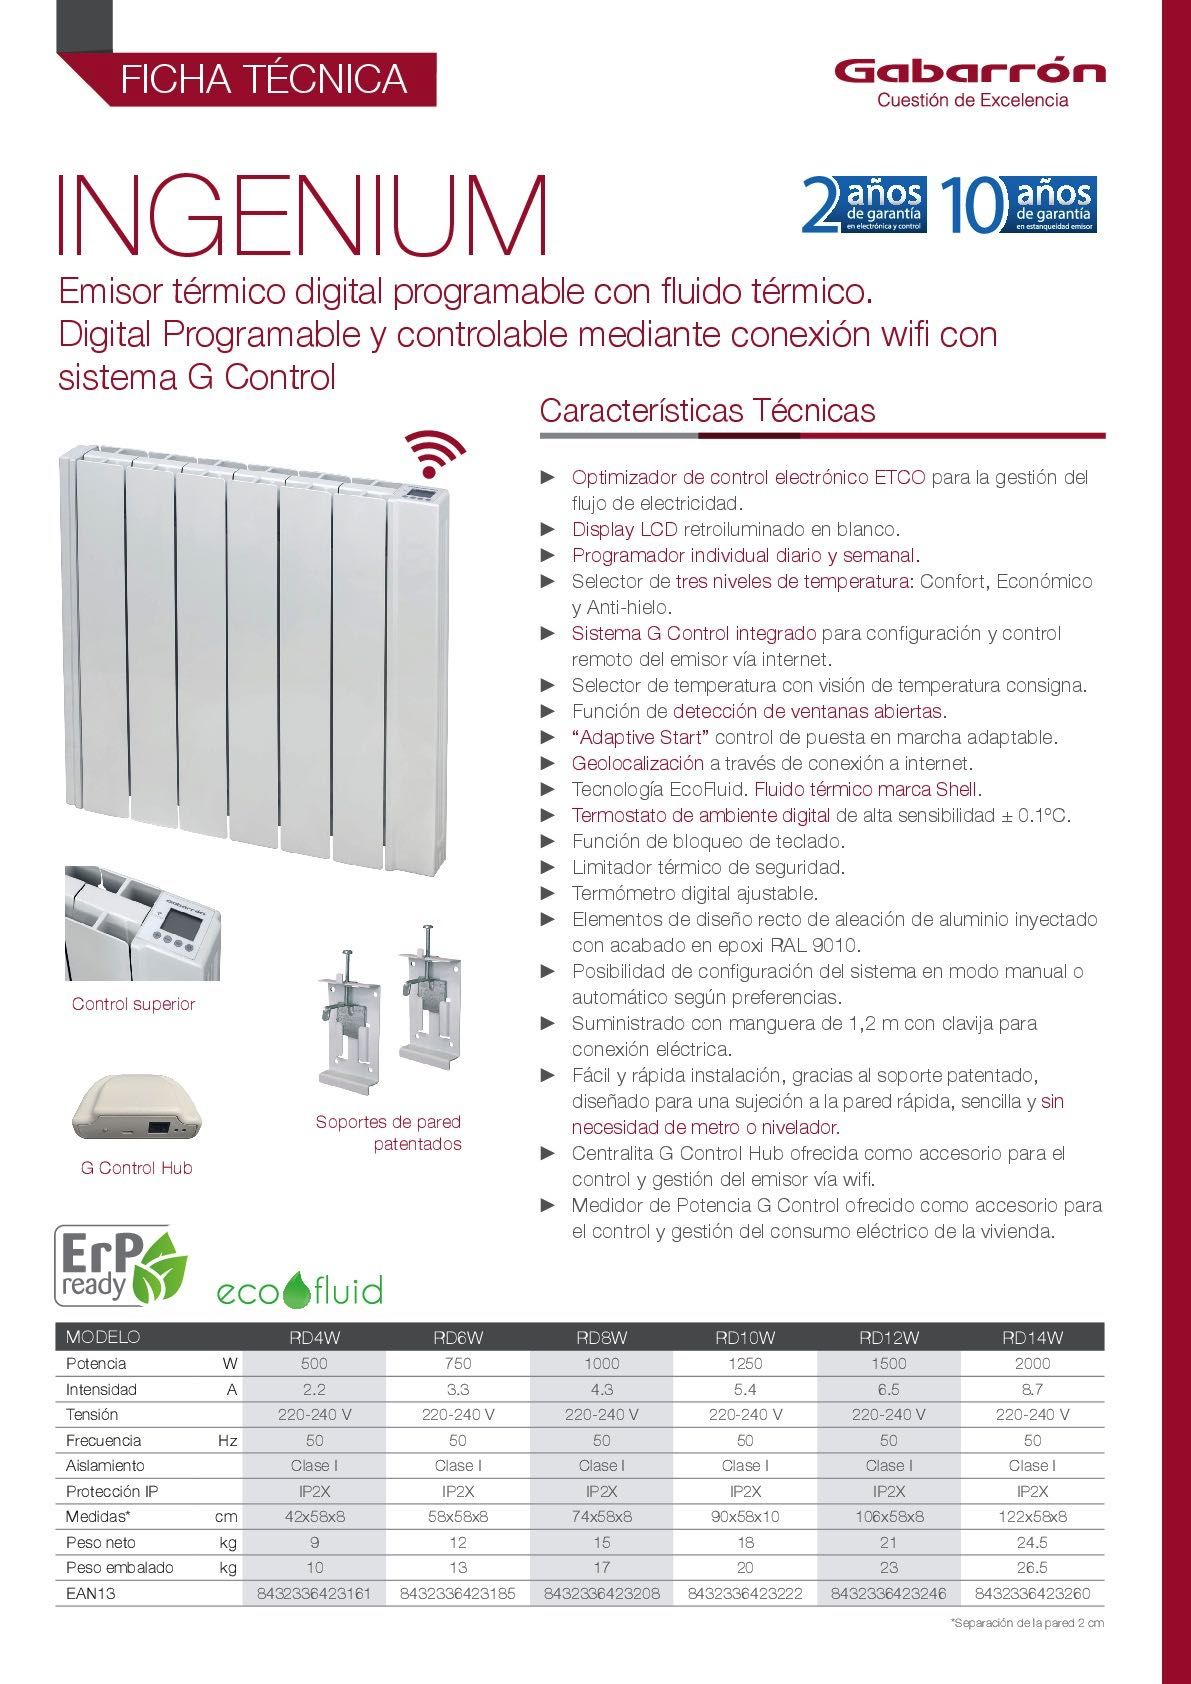 Ficha técnica Emisor térmico Gabarrón Wifi Ingenium